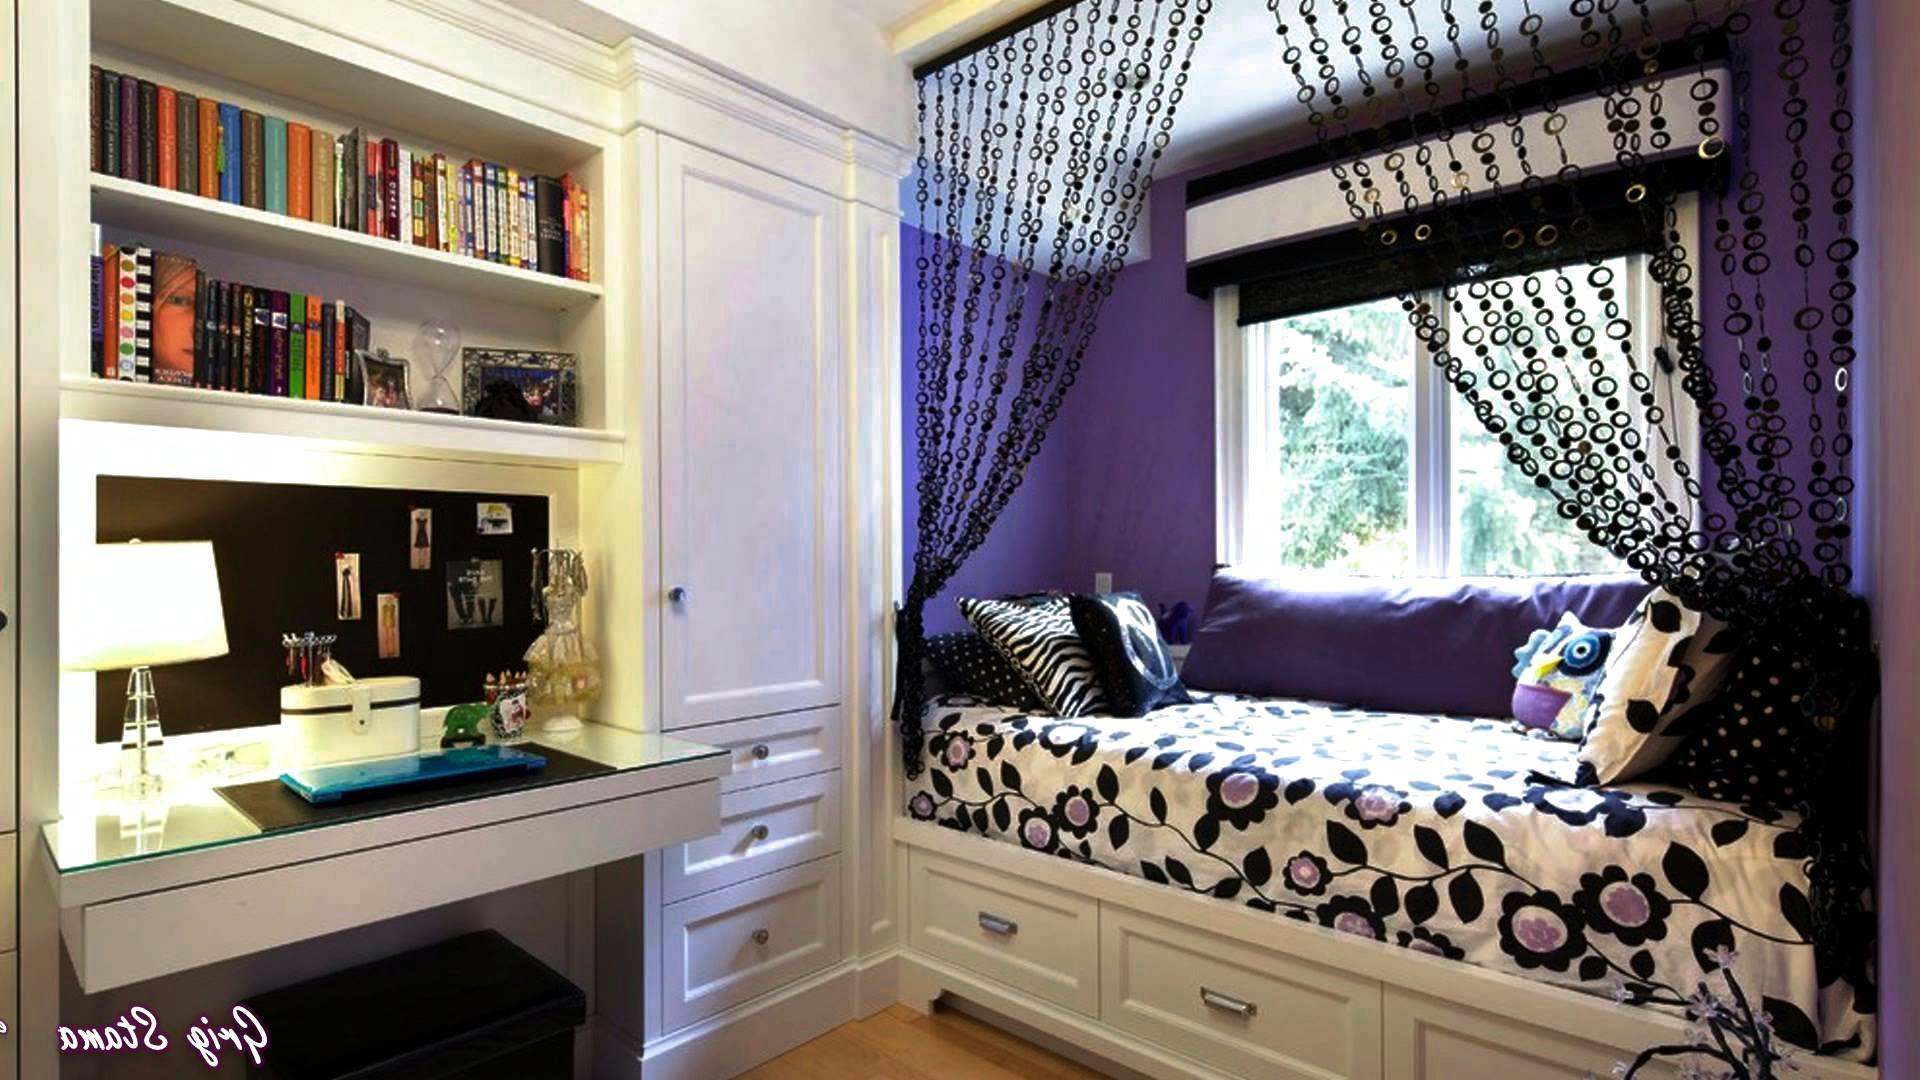 rooms decor ... furniture:room decor ideas charming room decor ideas 2 pretty tween YZFDCHP